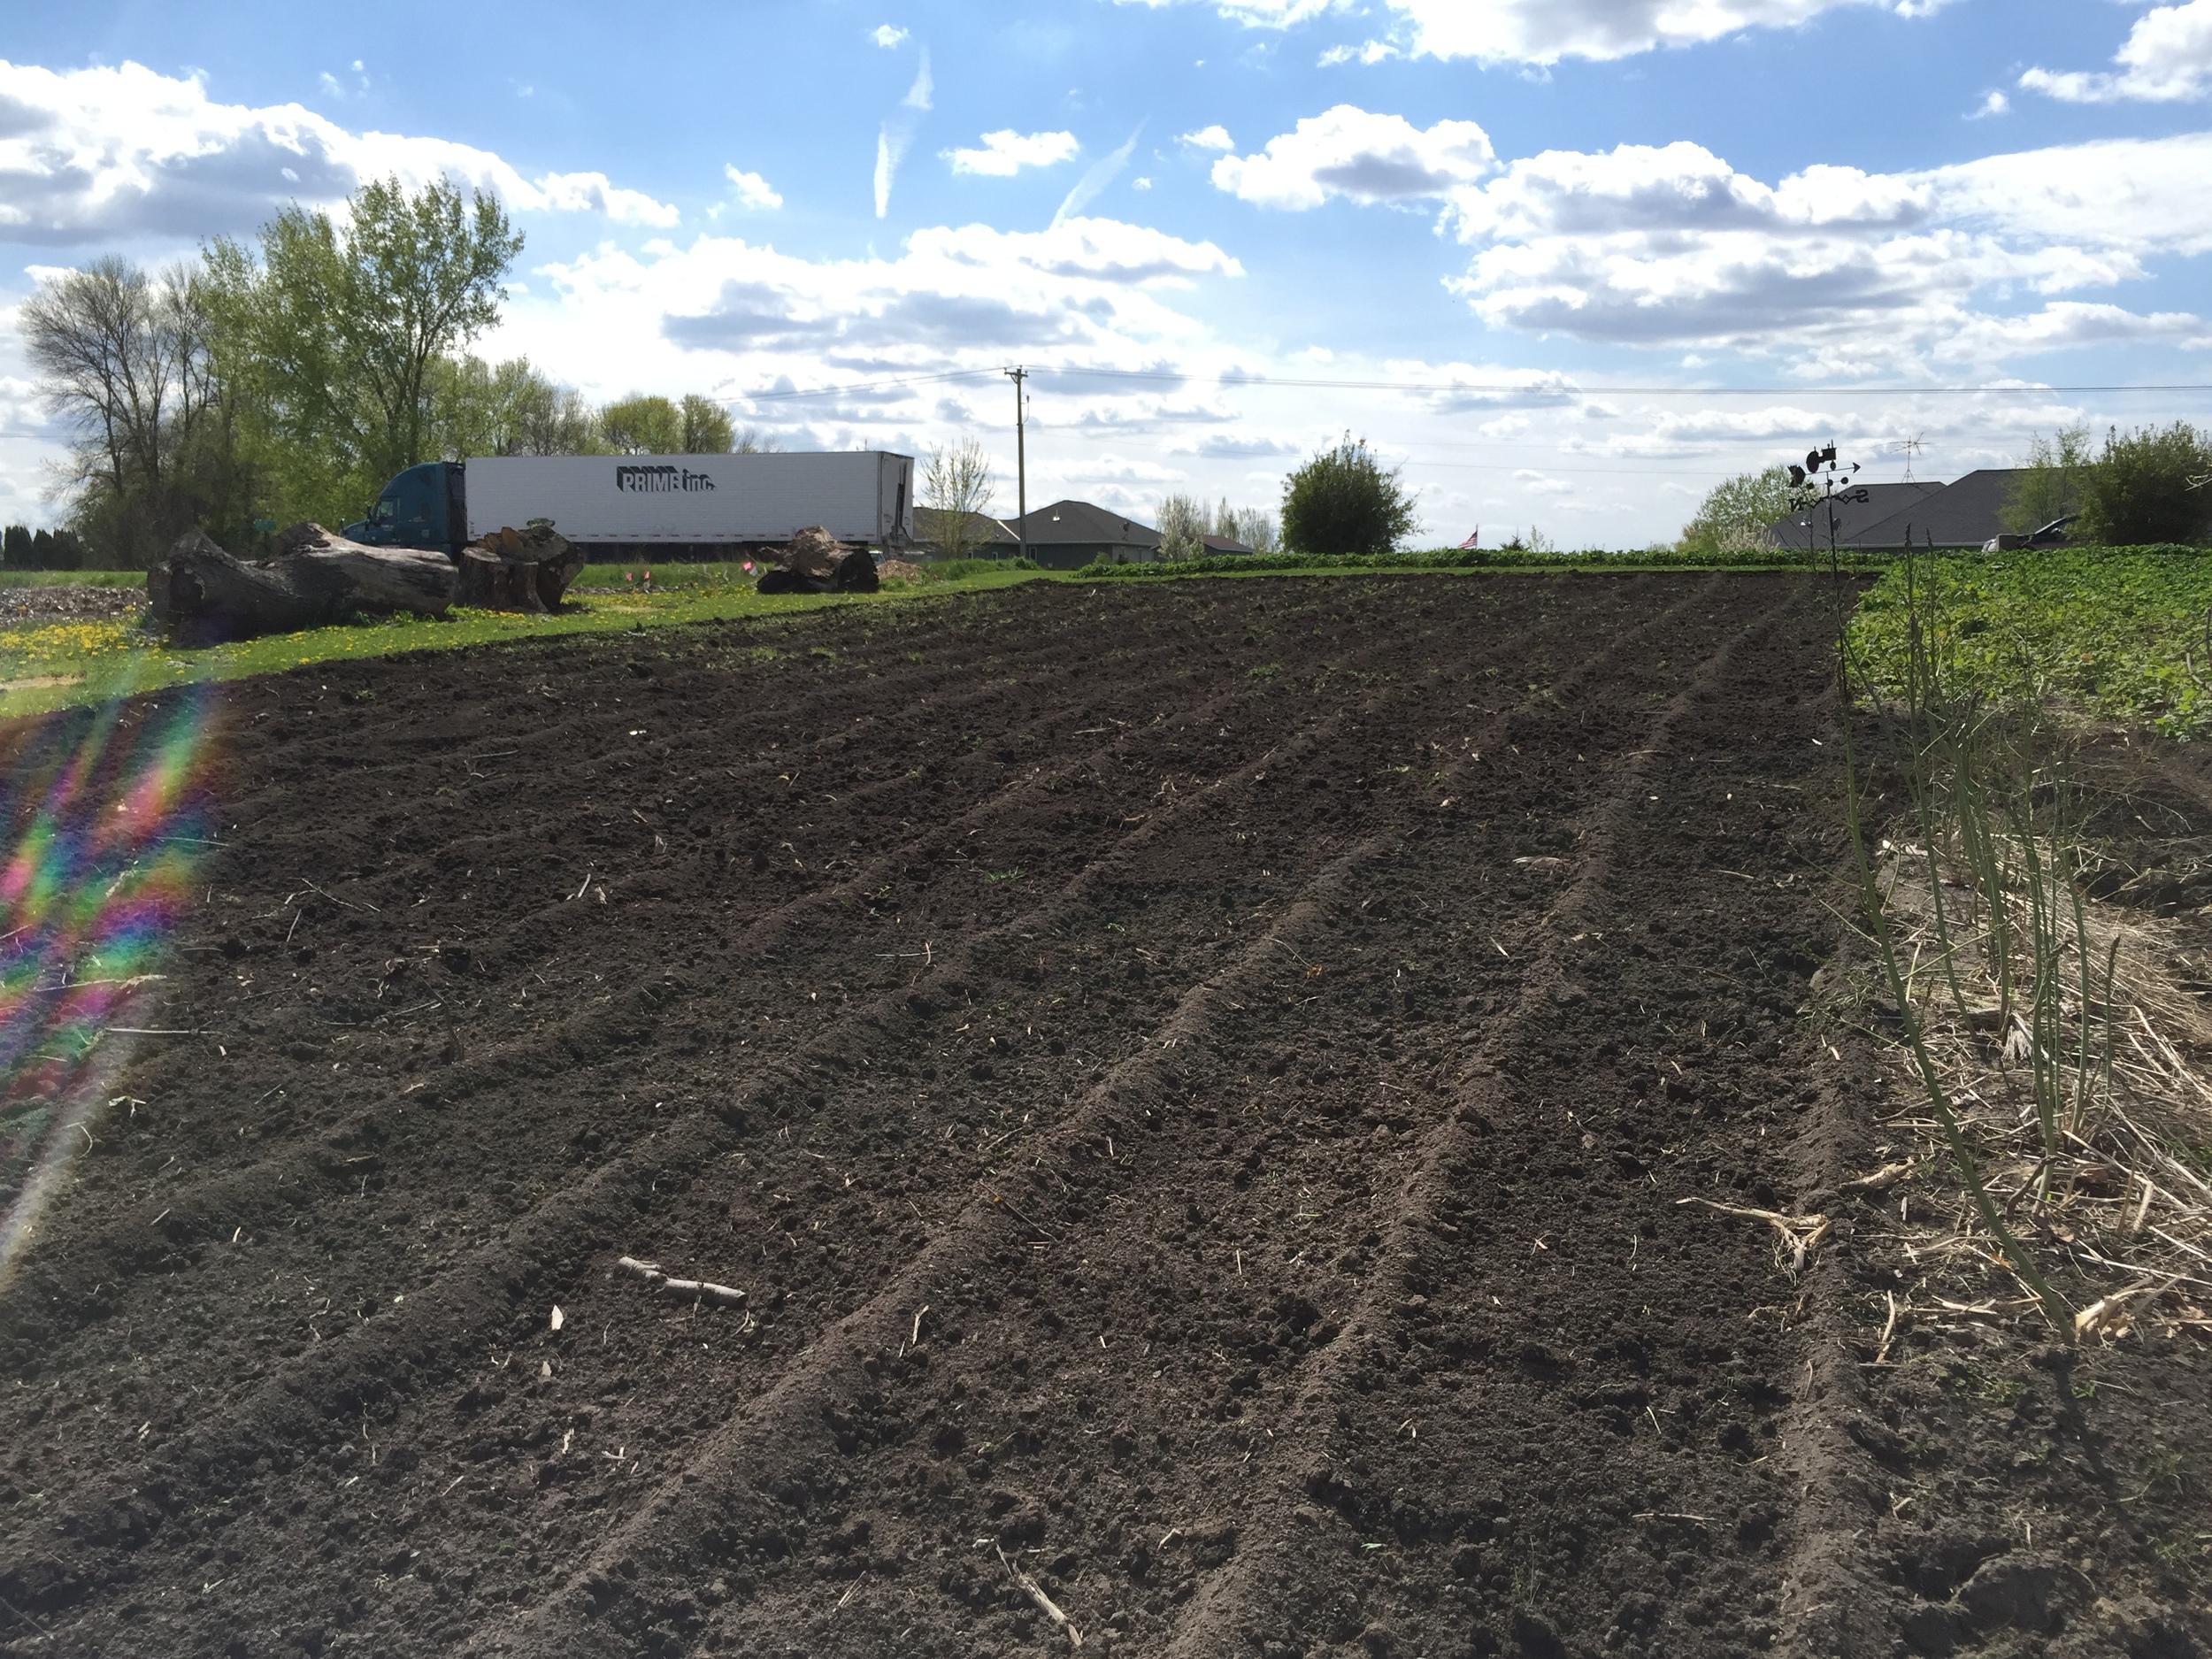 The garden plot, freshly tilled and ready for transplants.